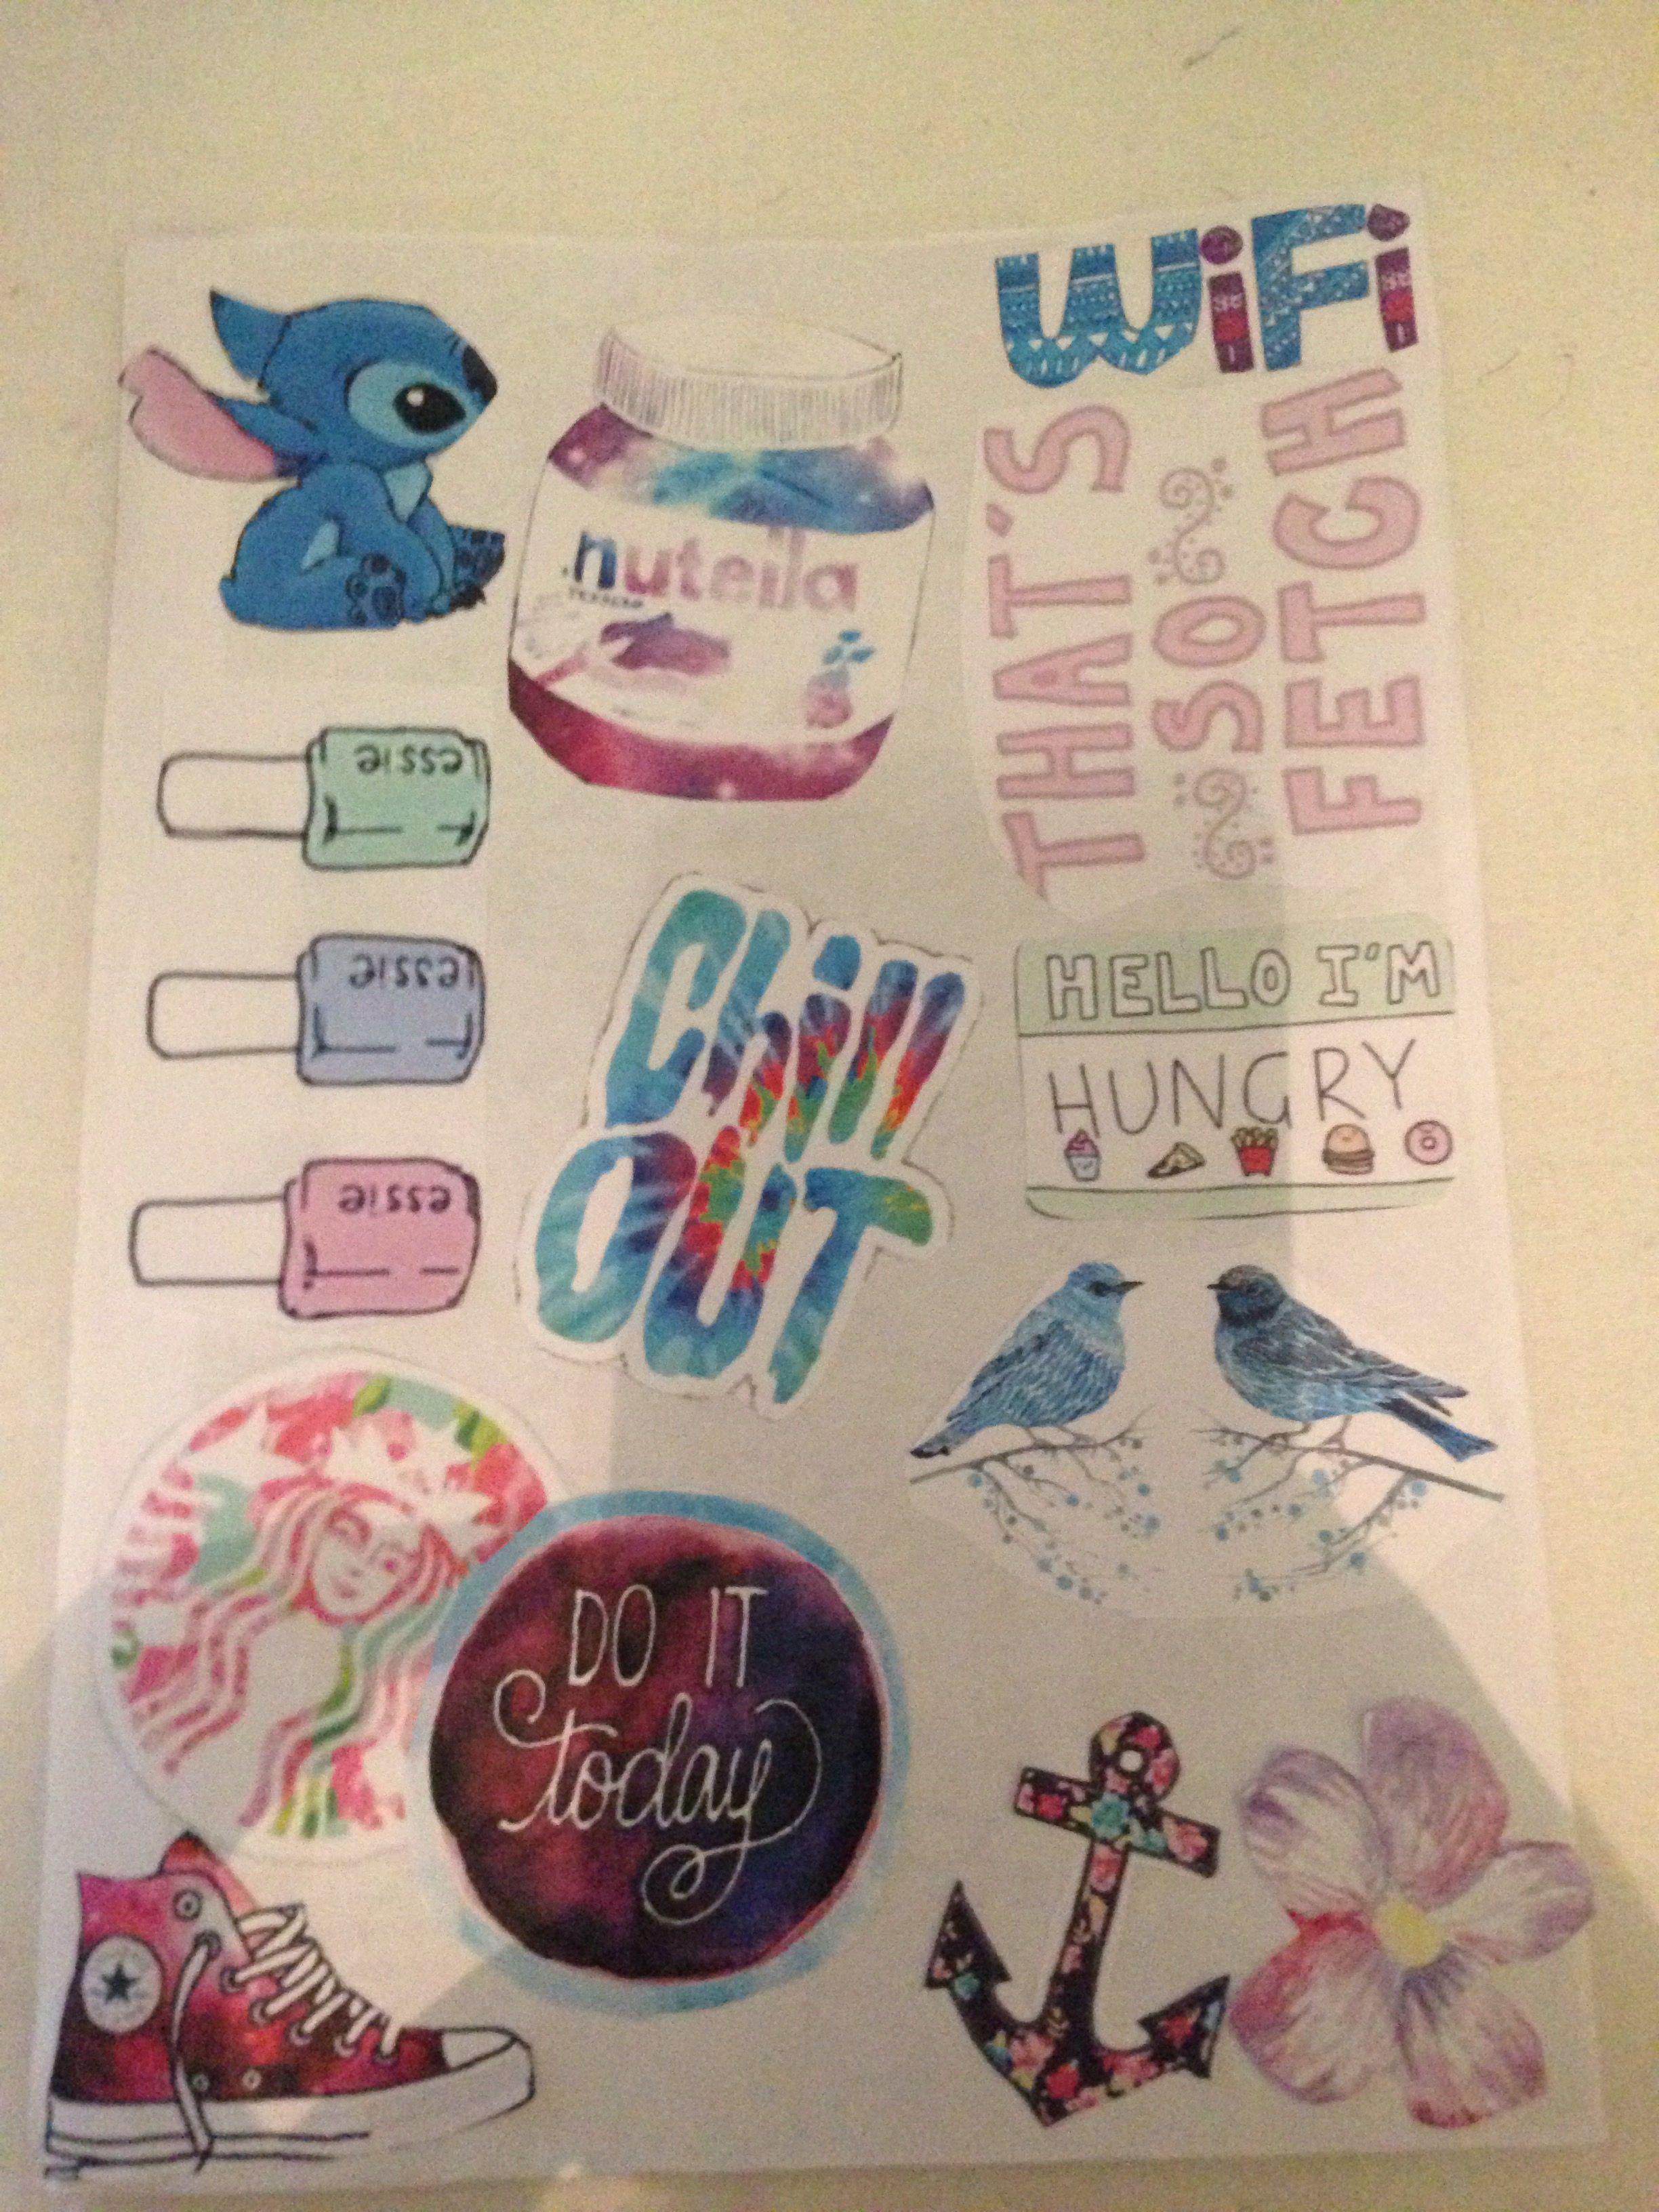 Cute tumblr notebook cover | Diy notebooks